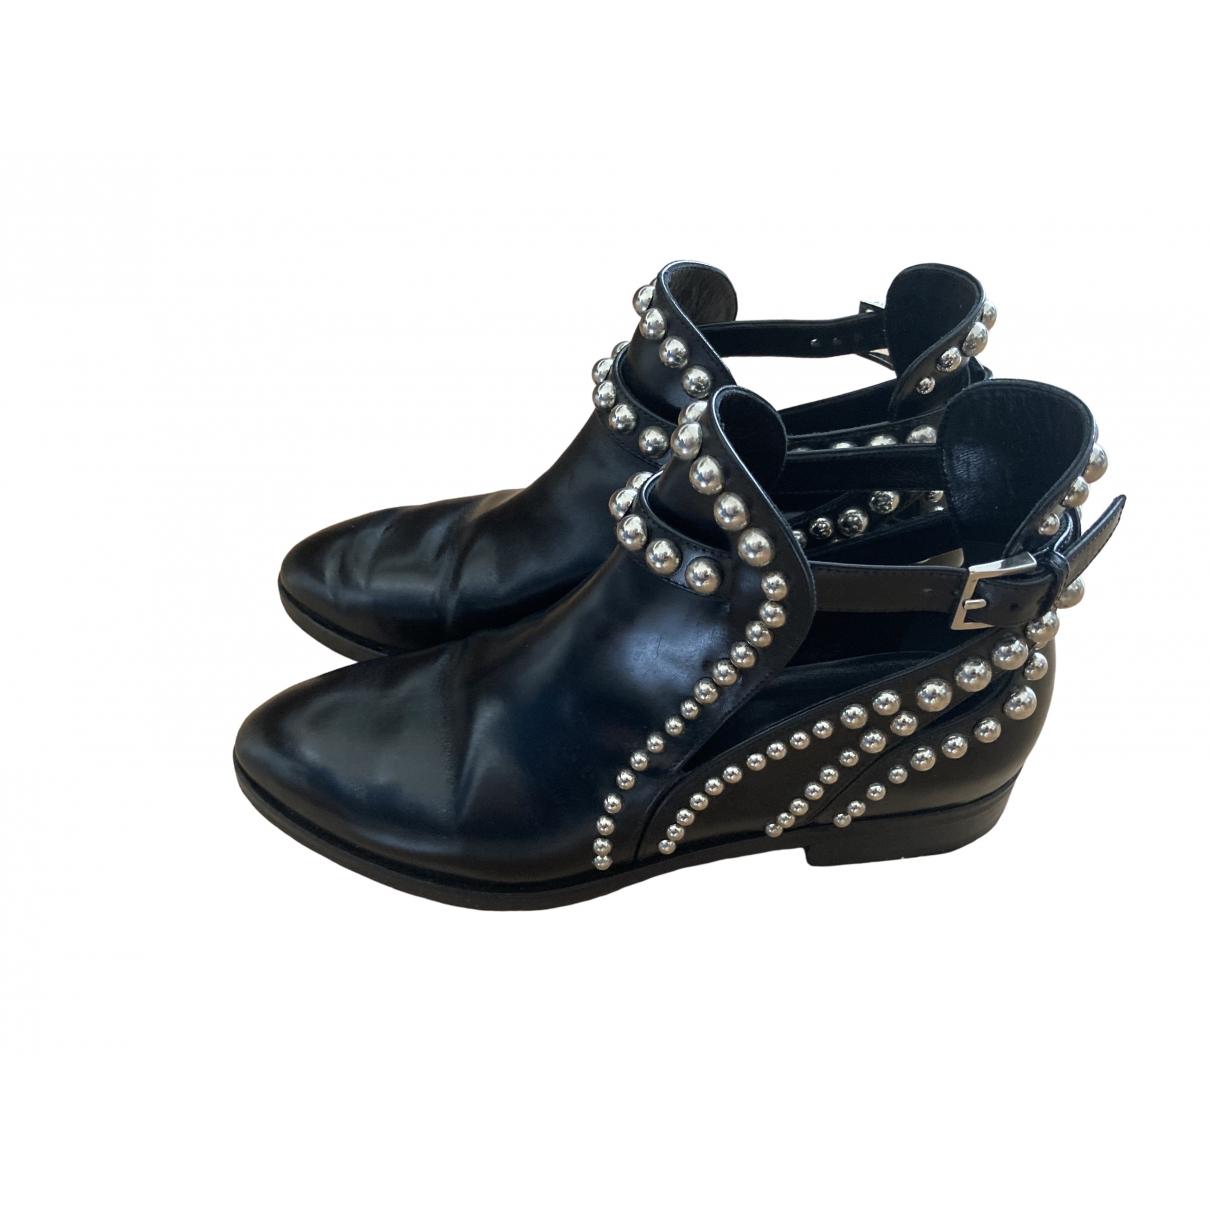 Alaïa \N Black Leather Ankle boots for Women 37.5 EU